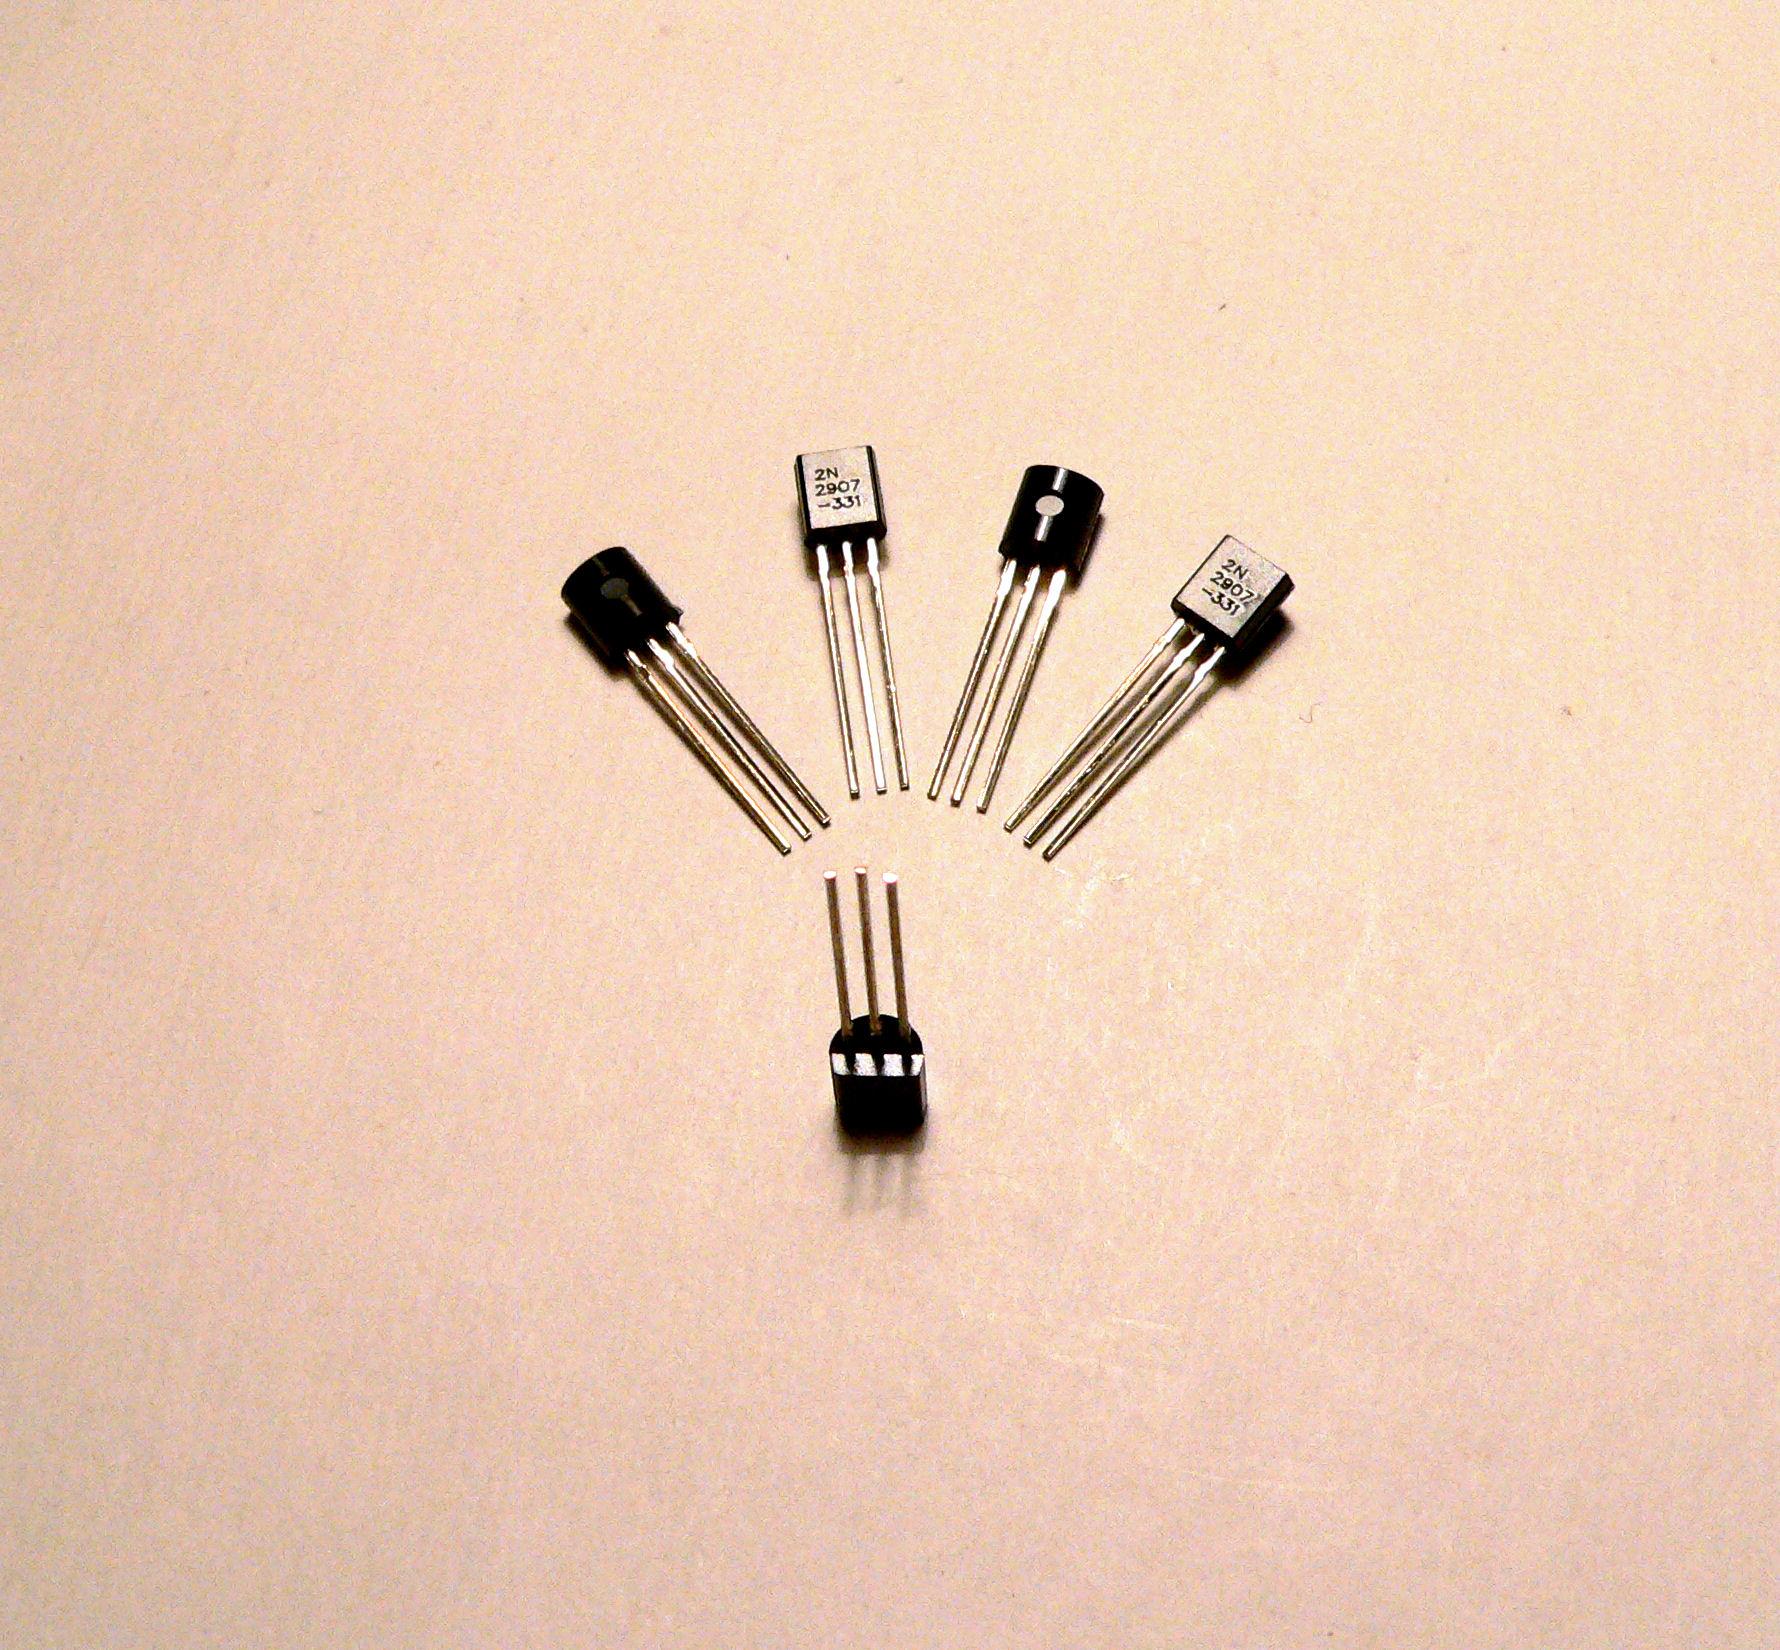 Npn Transistor Pin Configuration Pinout General Purpose Amplifier